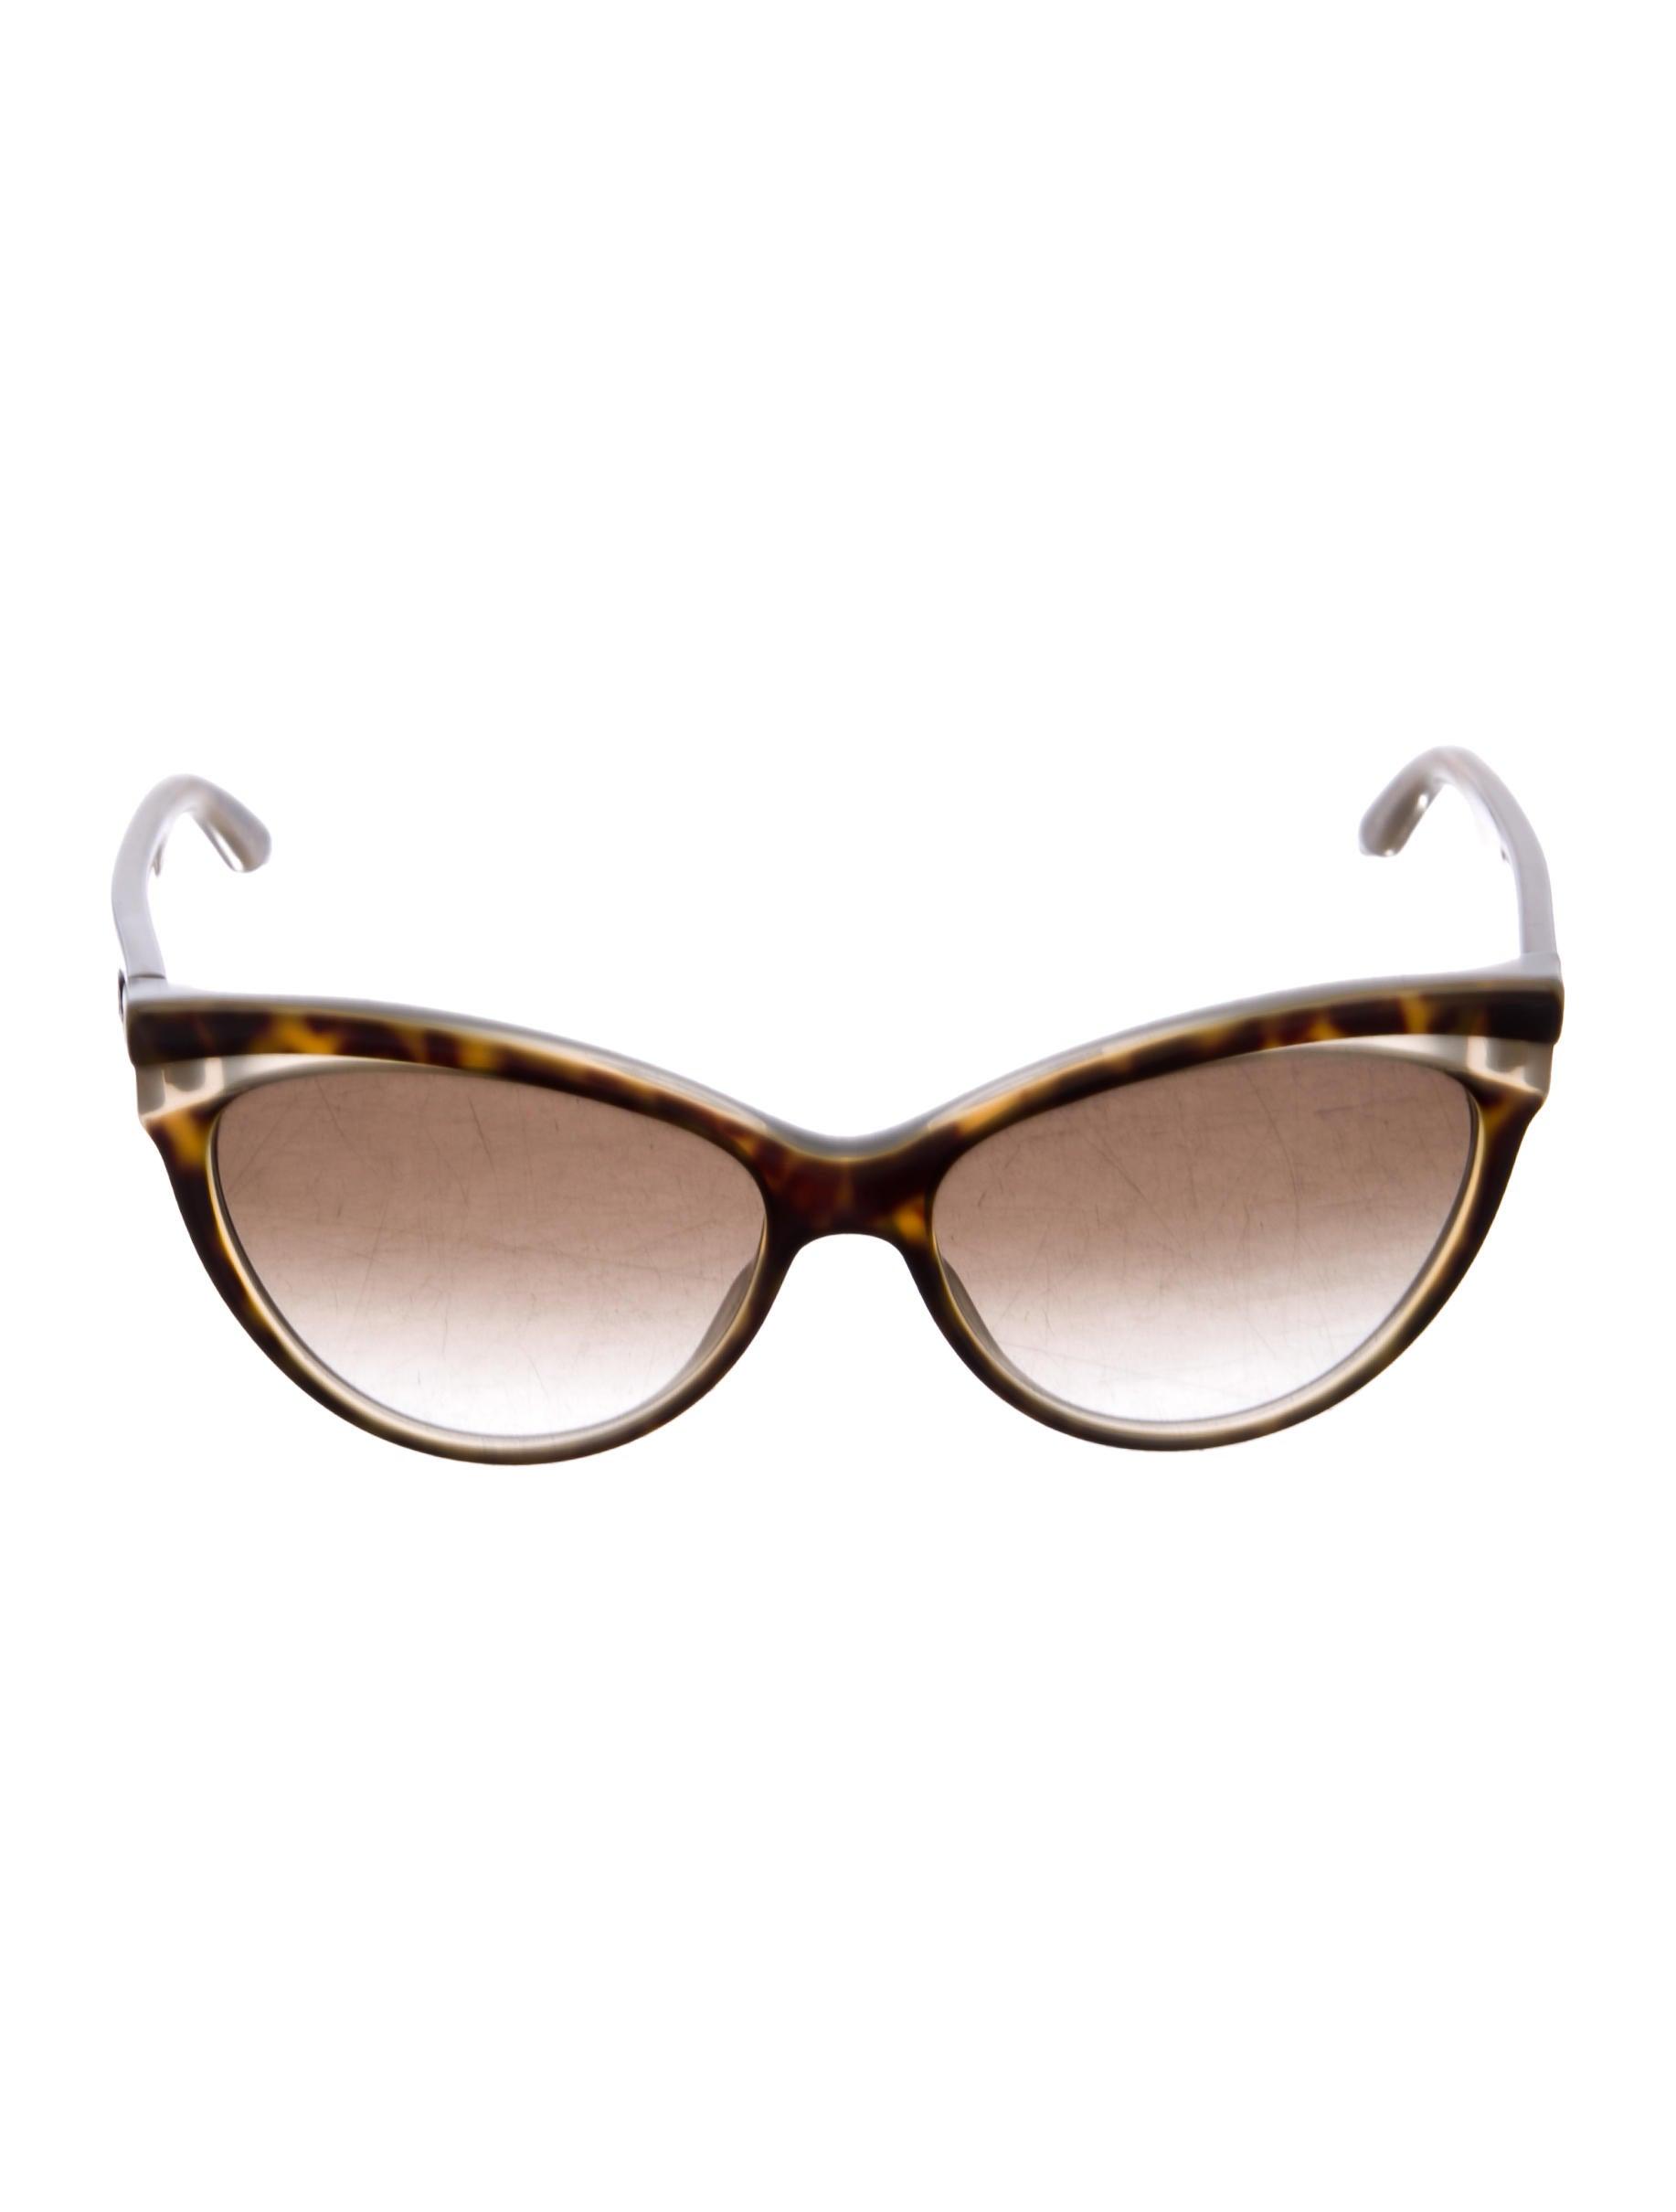 8a03654aa5e Christian Dior Logo Gradient Cat-Eye Sunglasses - Accessories ...